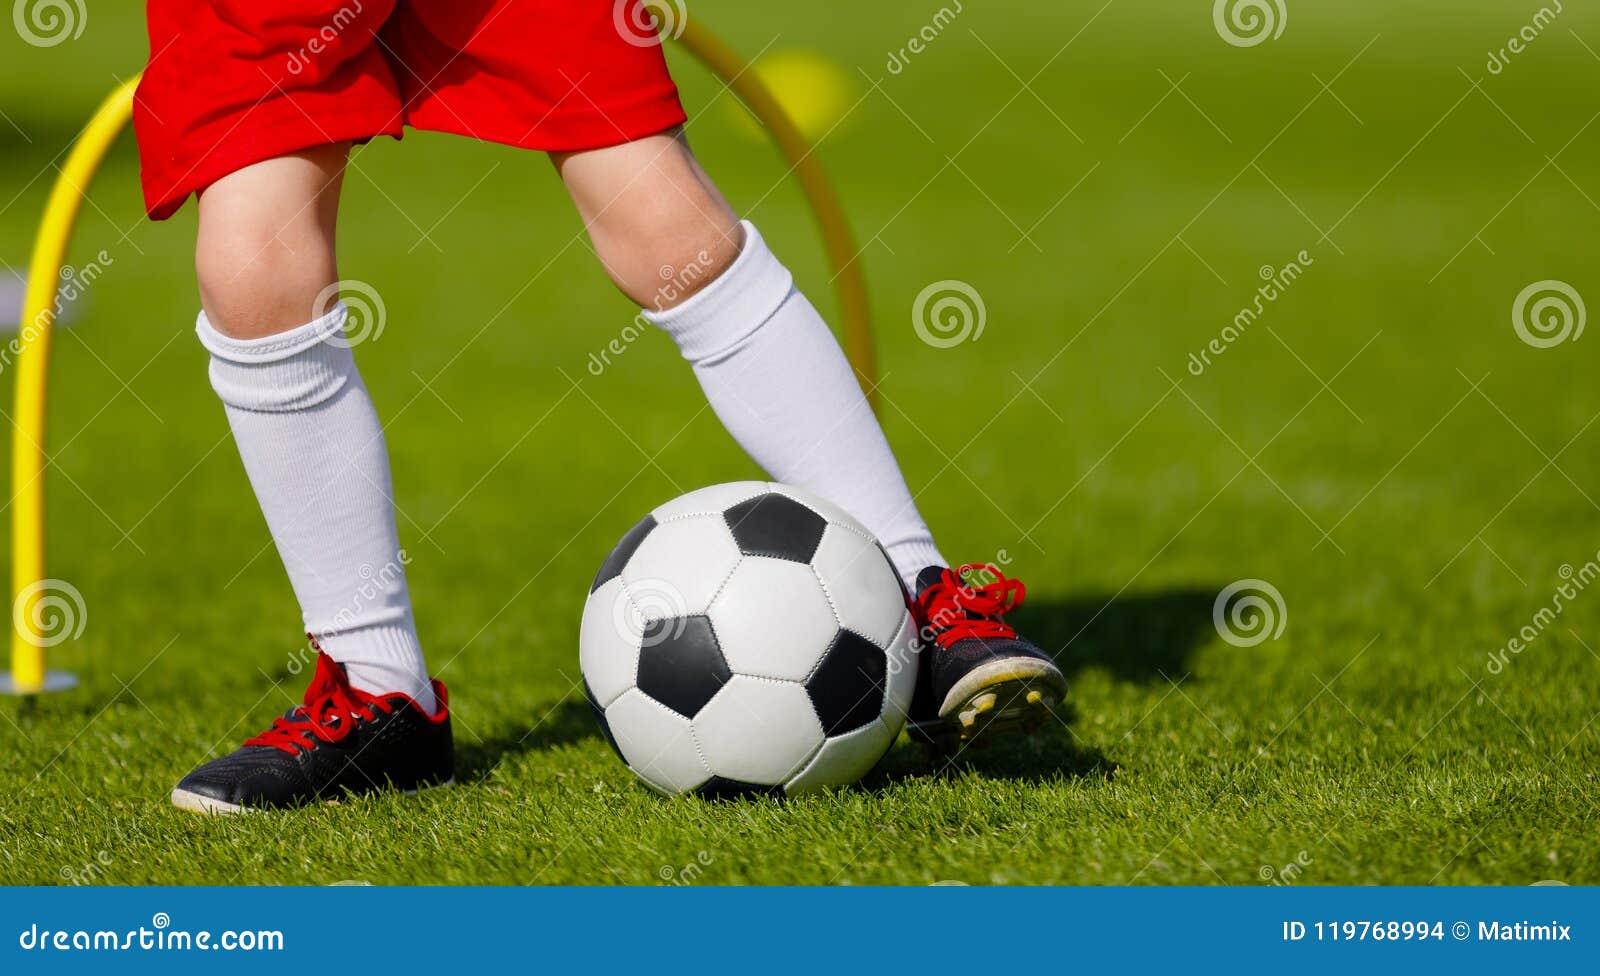 Addestramento di calcio per i bambini Junior Soccer Training Session Outdo